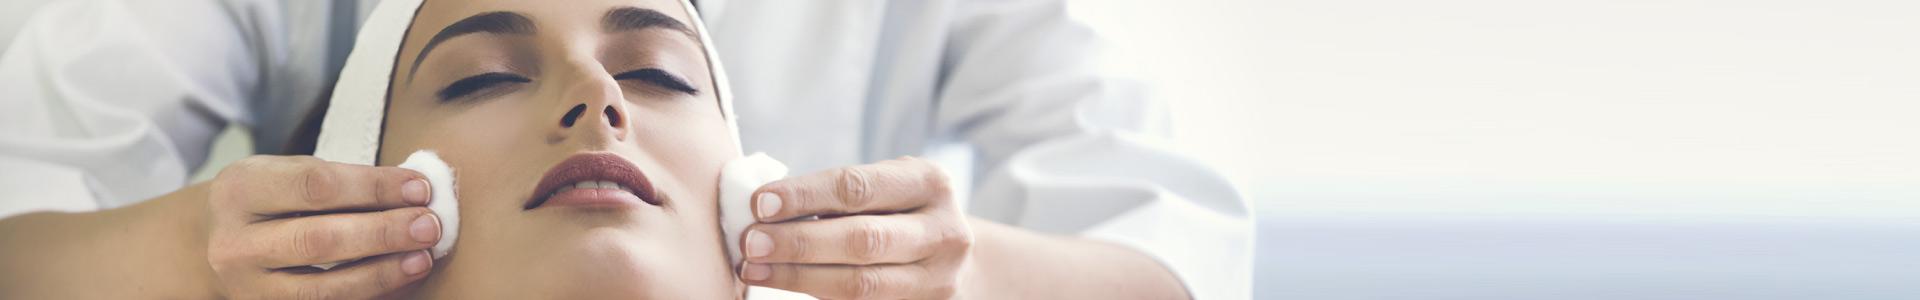 advanced dermatology professional skin care